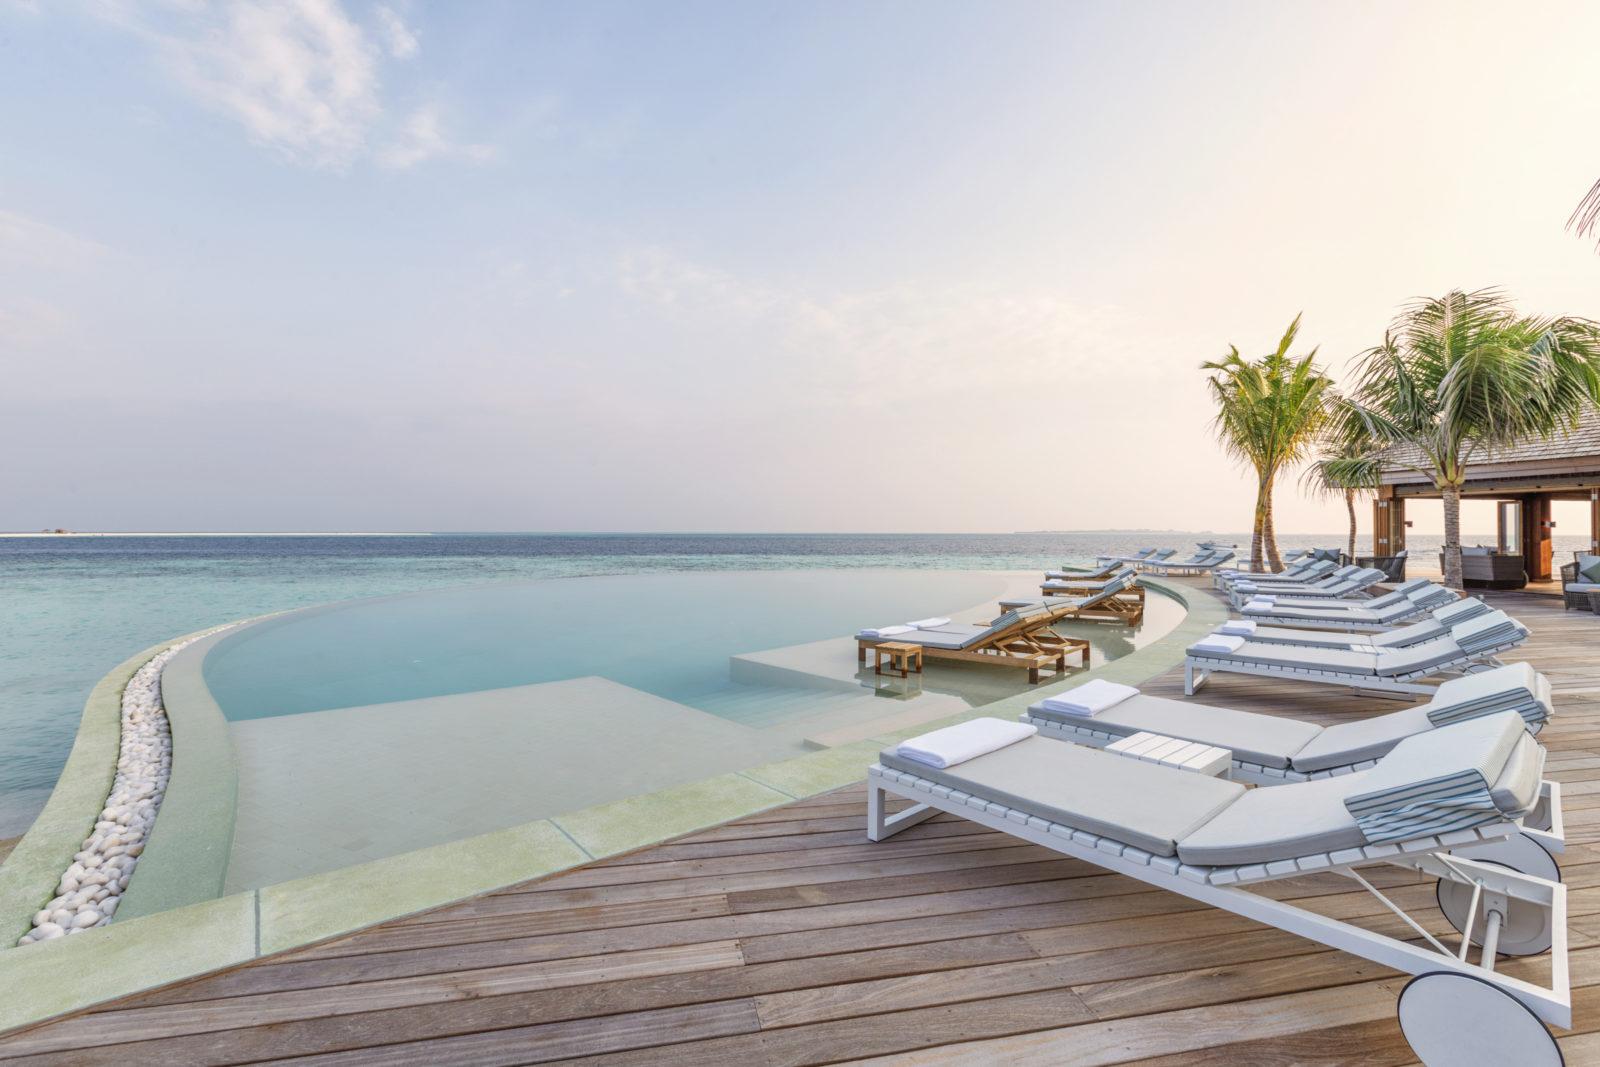 unbeschreiblich 12 tage malediven in top 5 ocean pool villa mit halbpension flug transfer. Black Bedroom Furniture Sets. Home Design Ideas